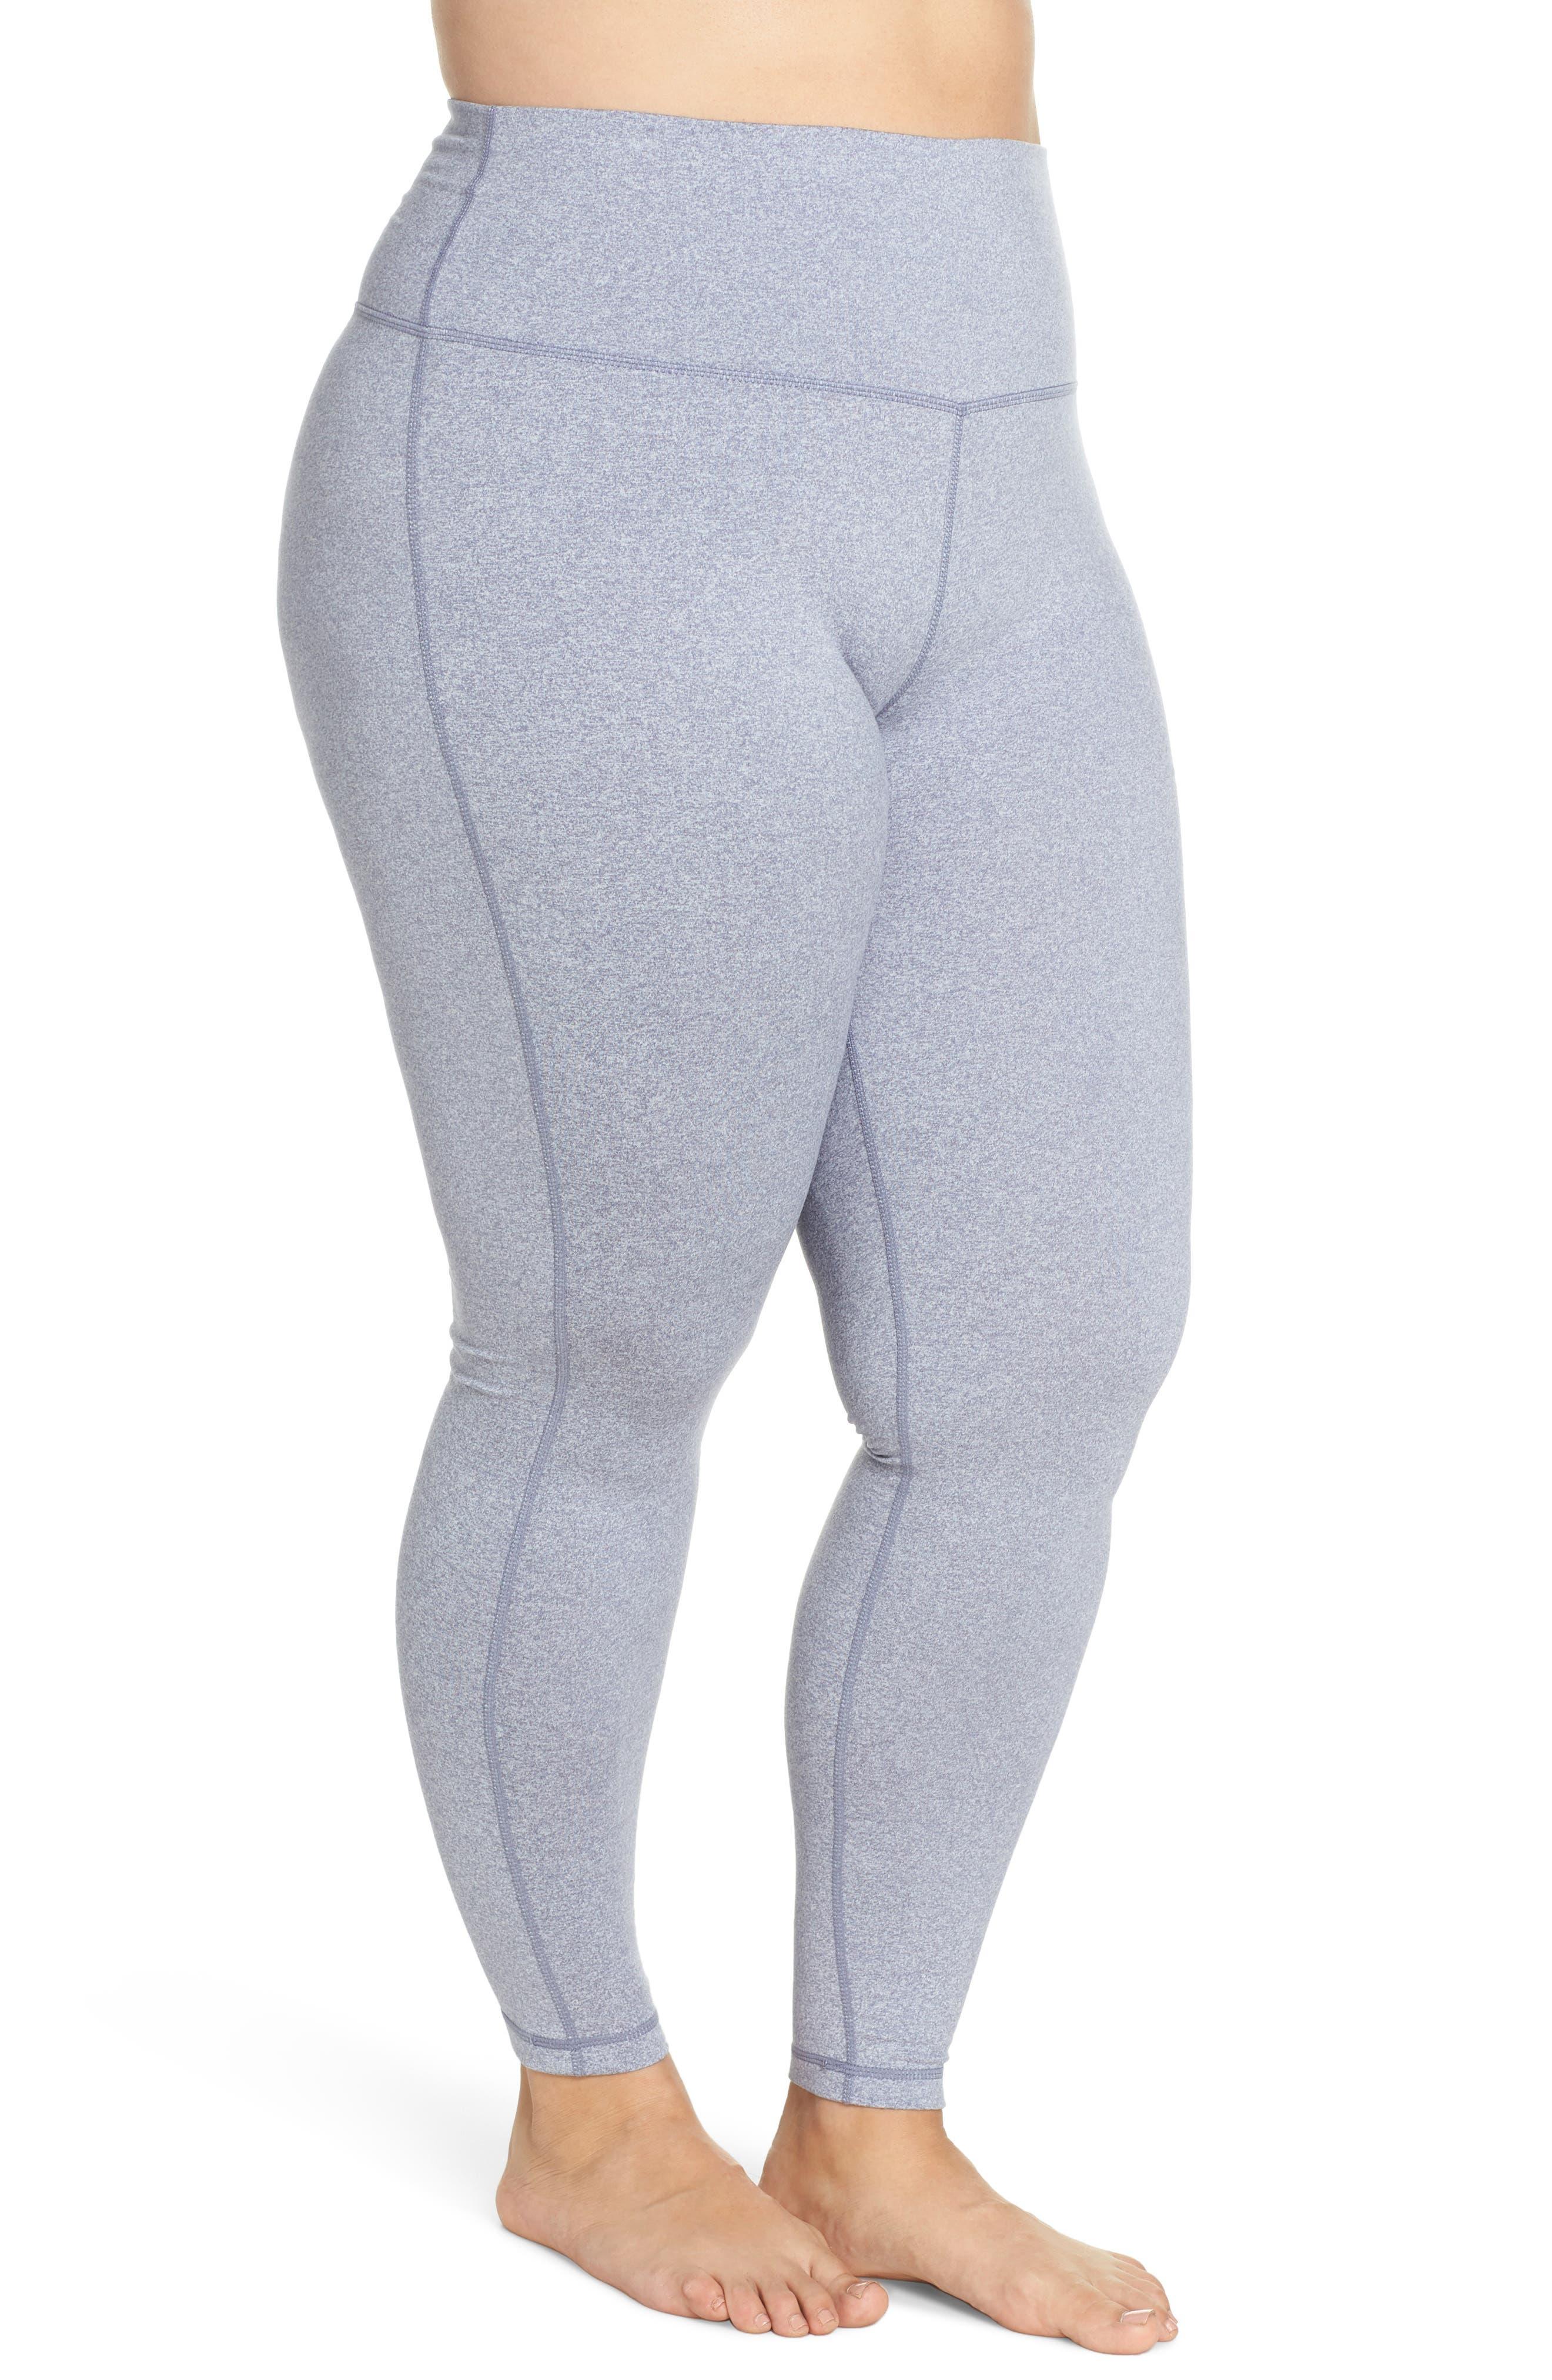 Ultrasoft Recycled High Waist Leggings,                             Alternate thumbnail 3, color,                             GREY GRANITE